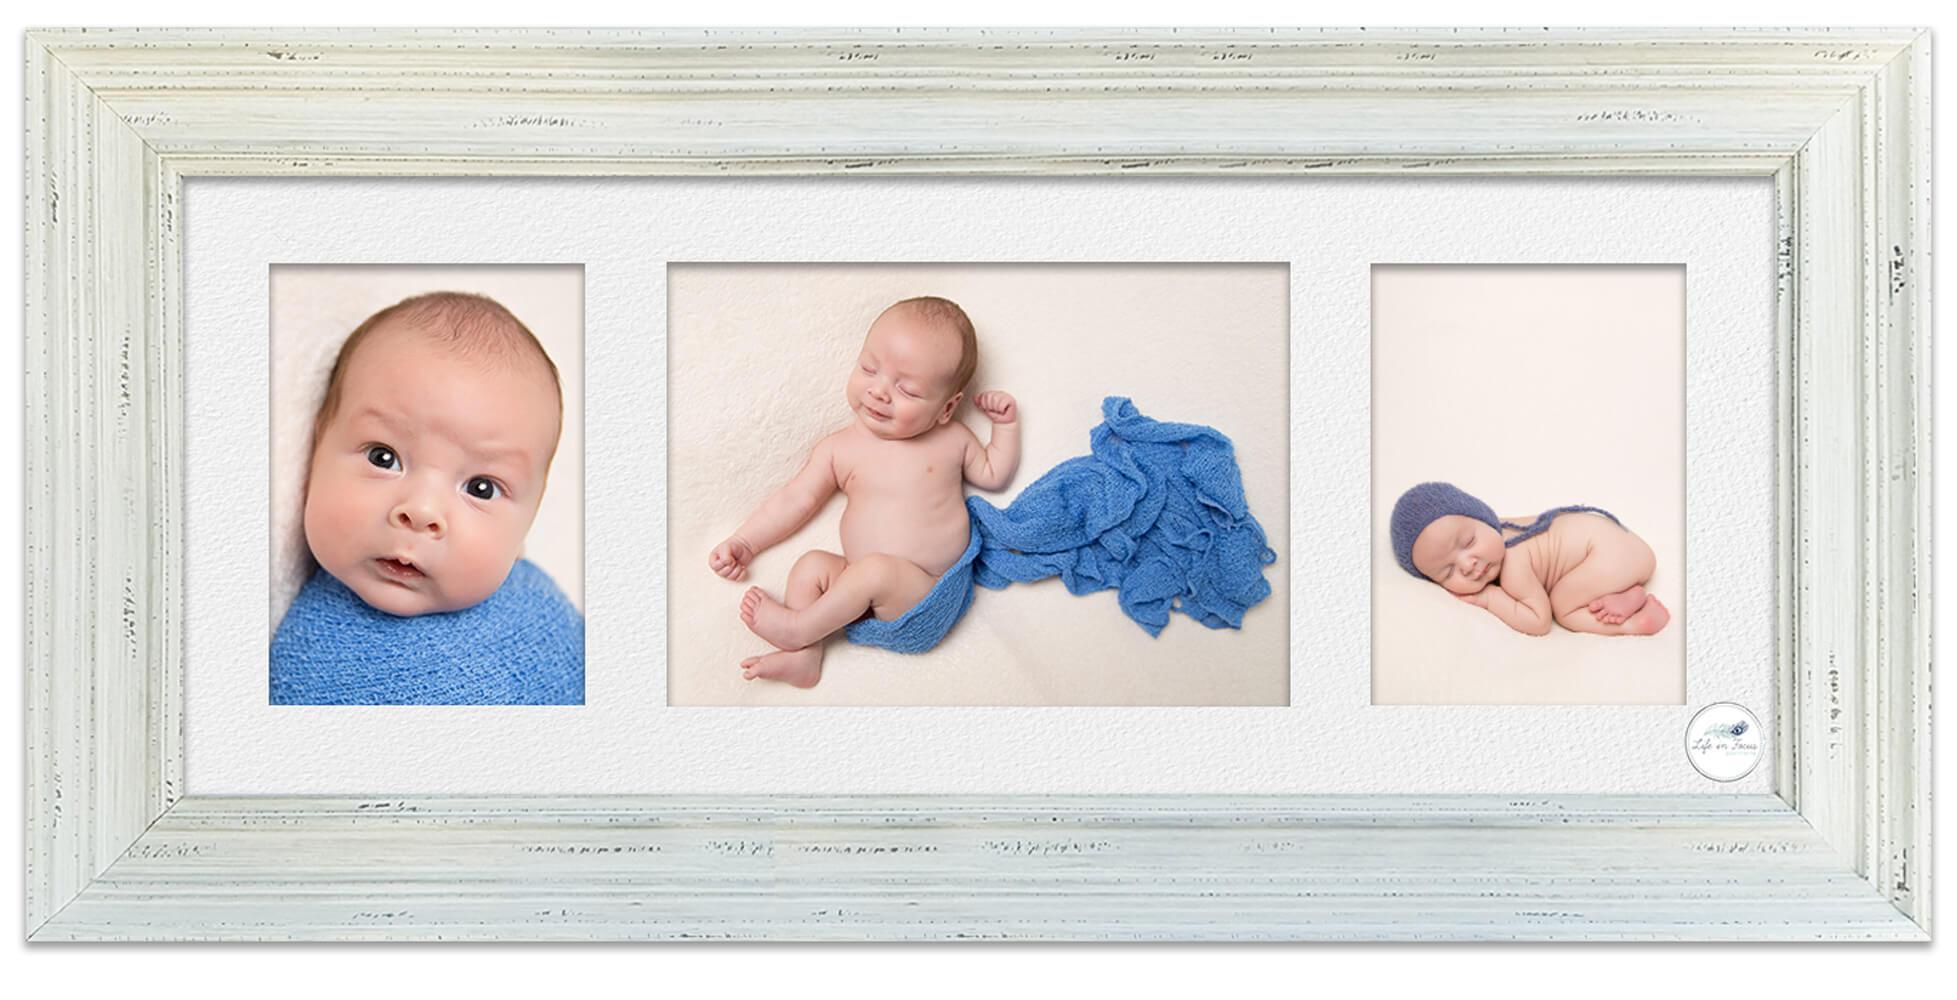 Framed baby photos newborn baby oy Life in Focus Portraits newborn baby photography Rhu Helensburgh Cardross